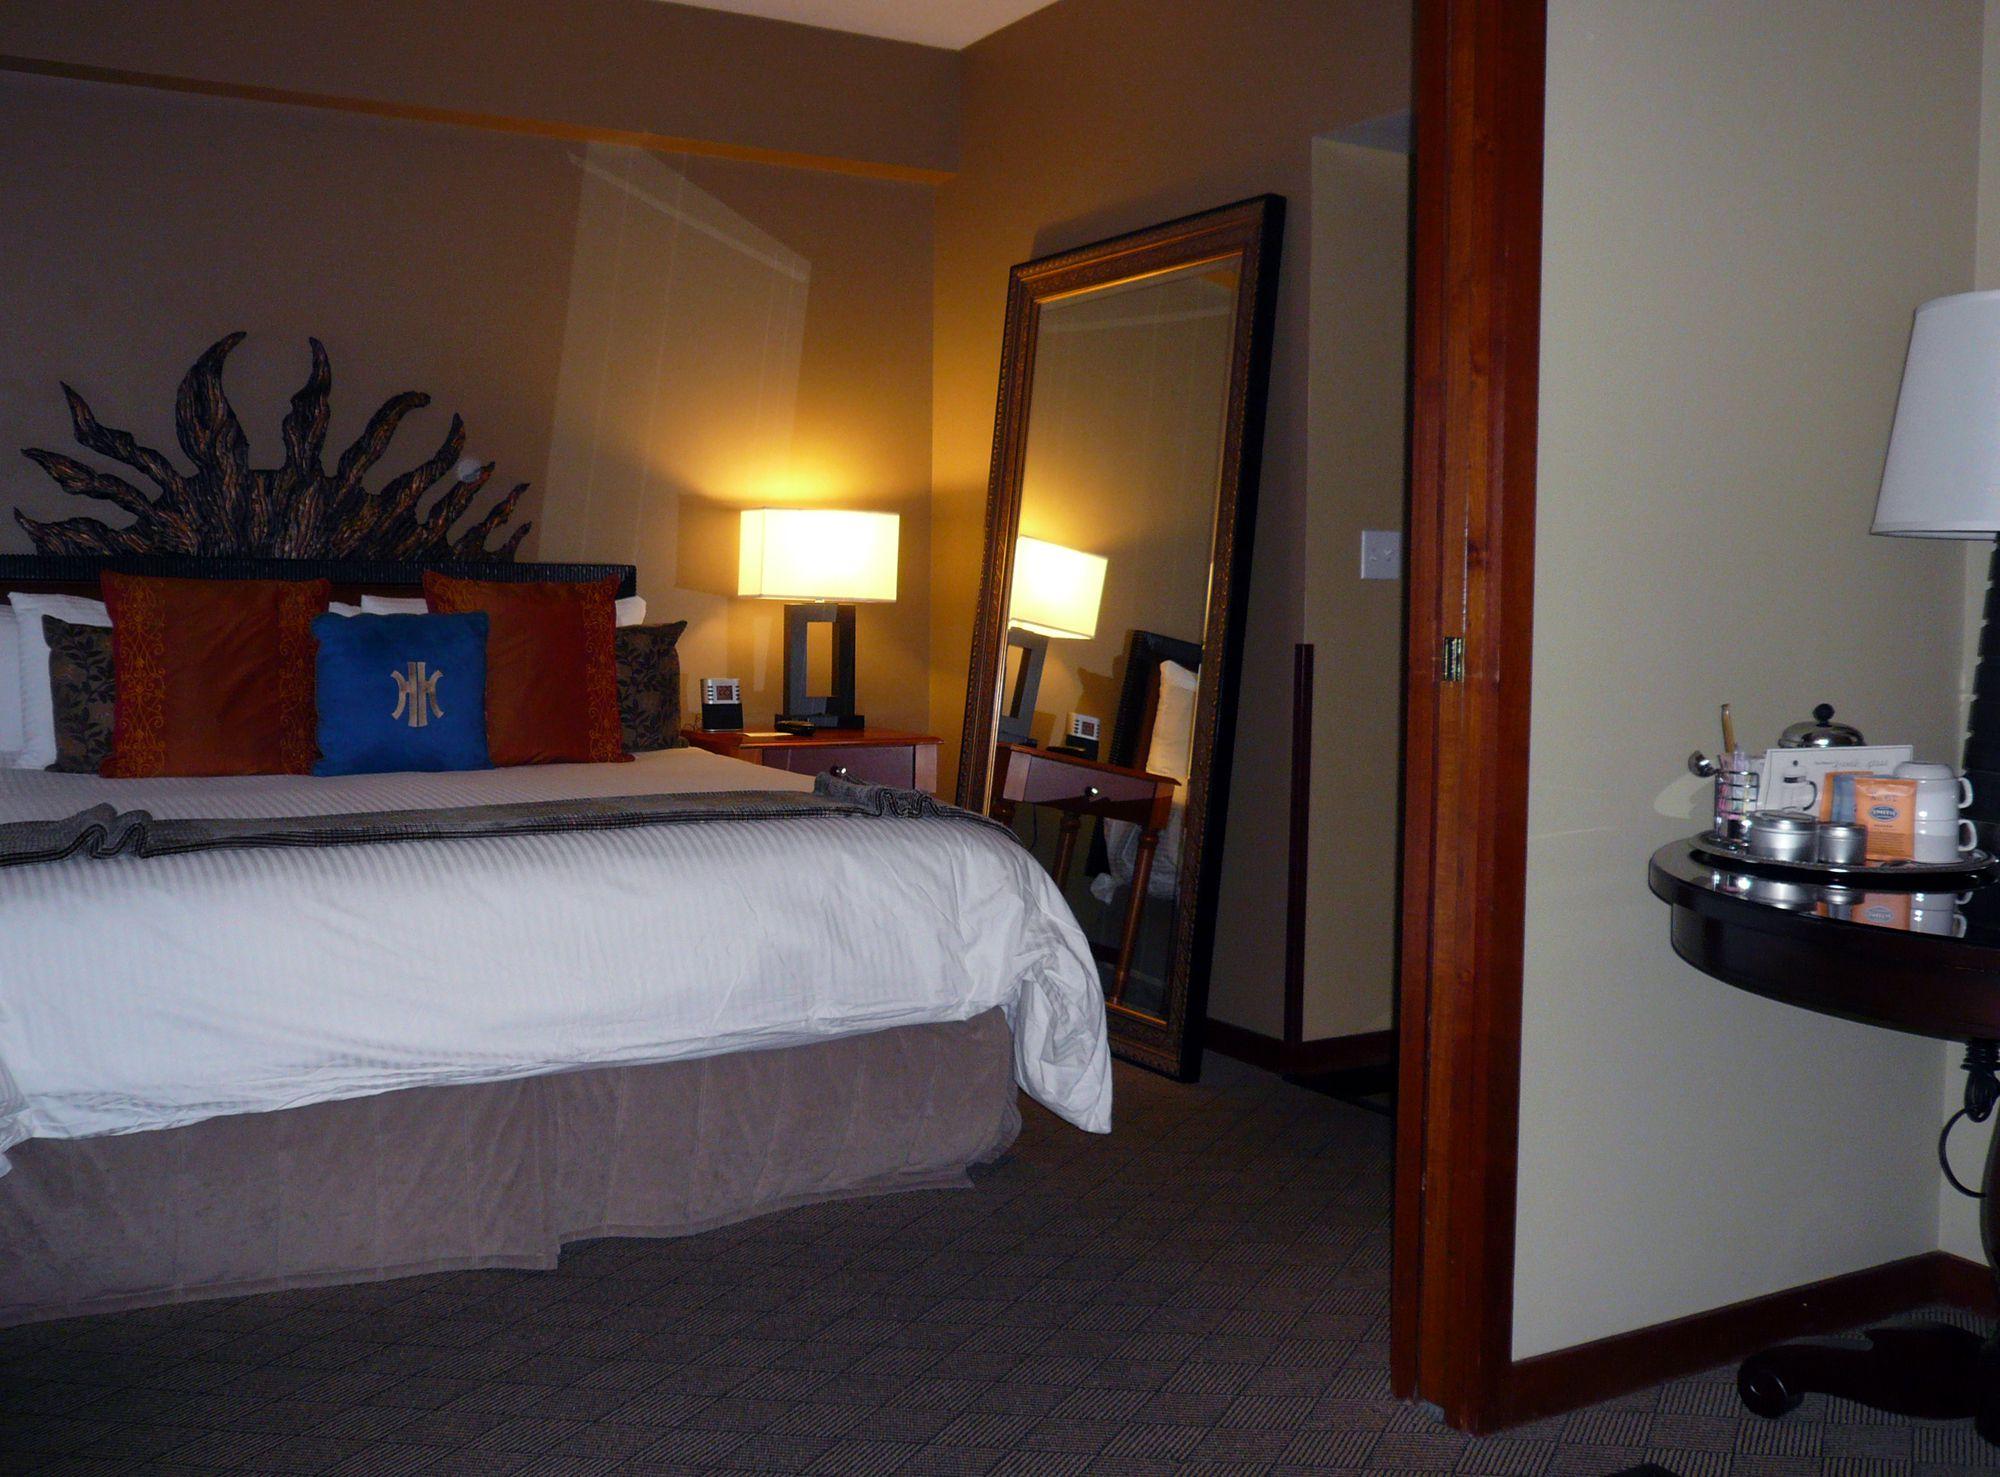 Hotel Candy Hall Romantic Getaways In Washington State